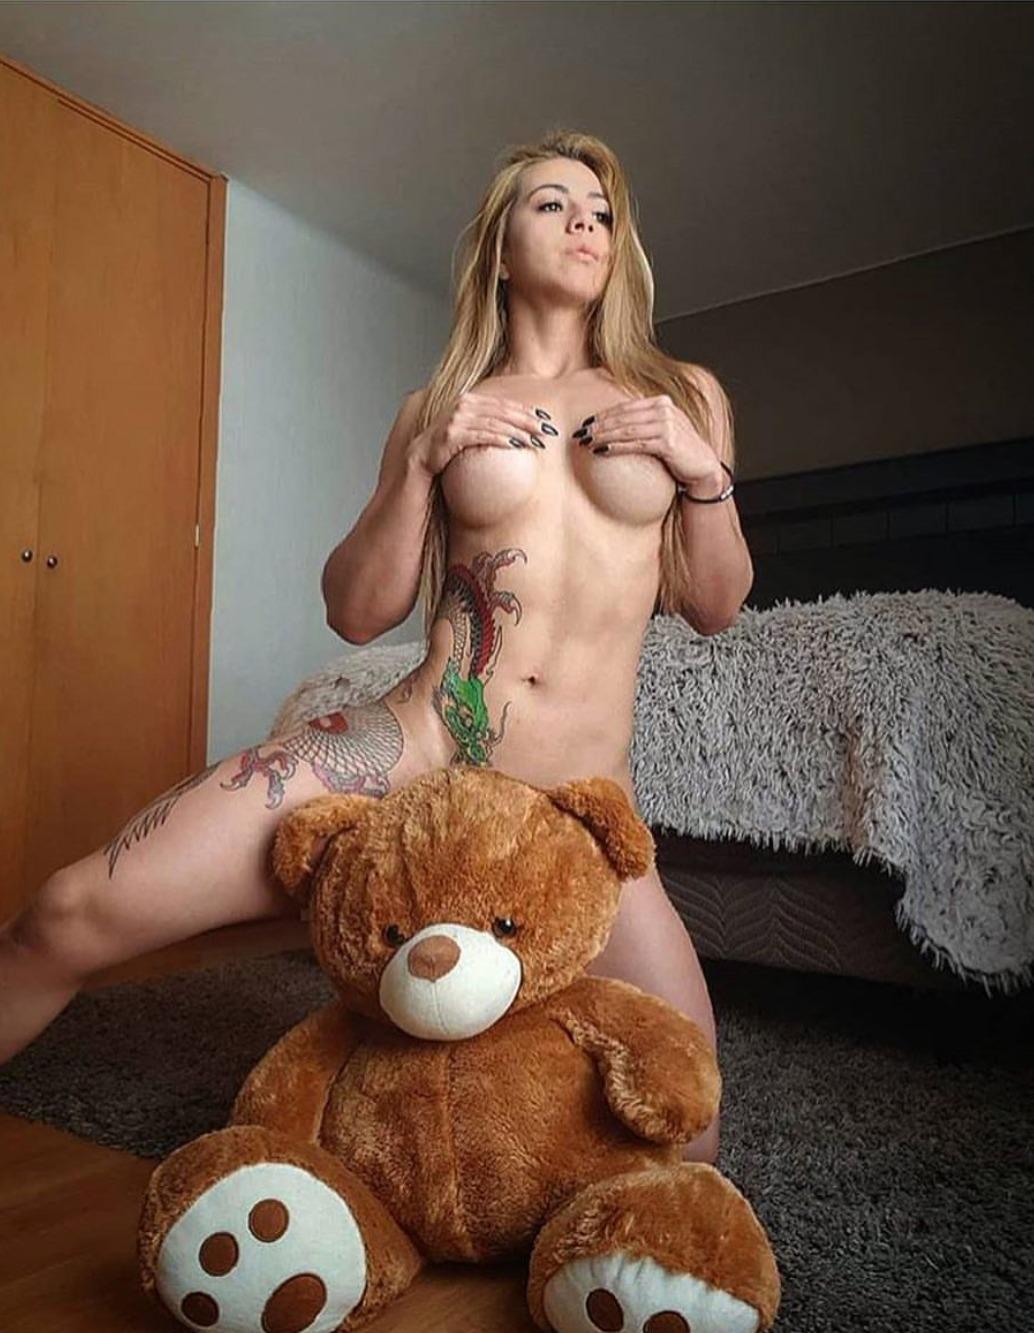 Male porn sex video